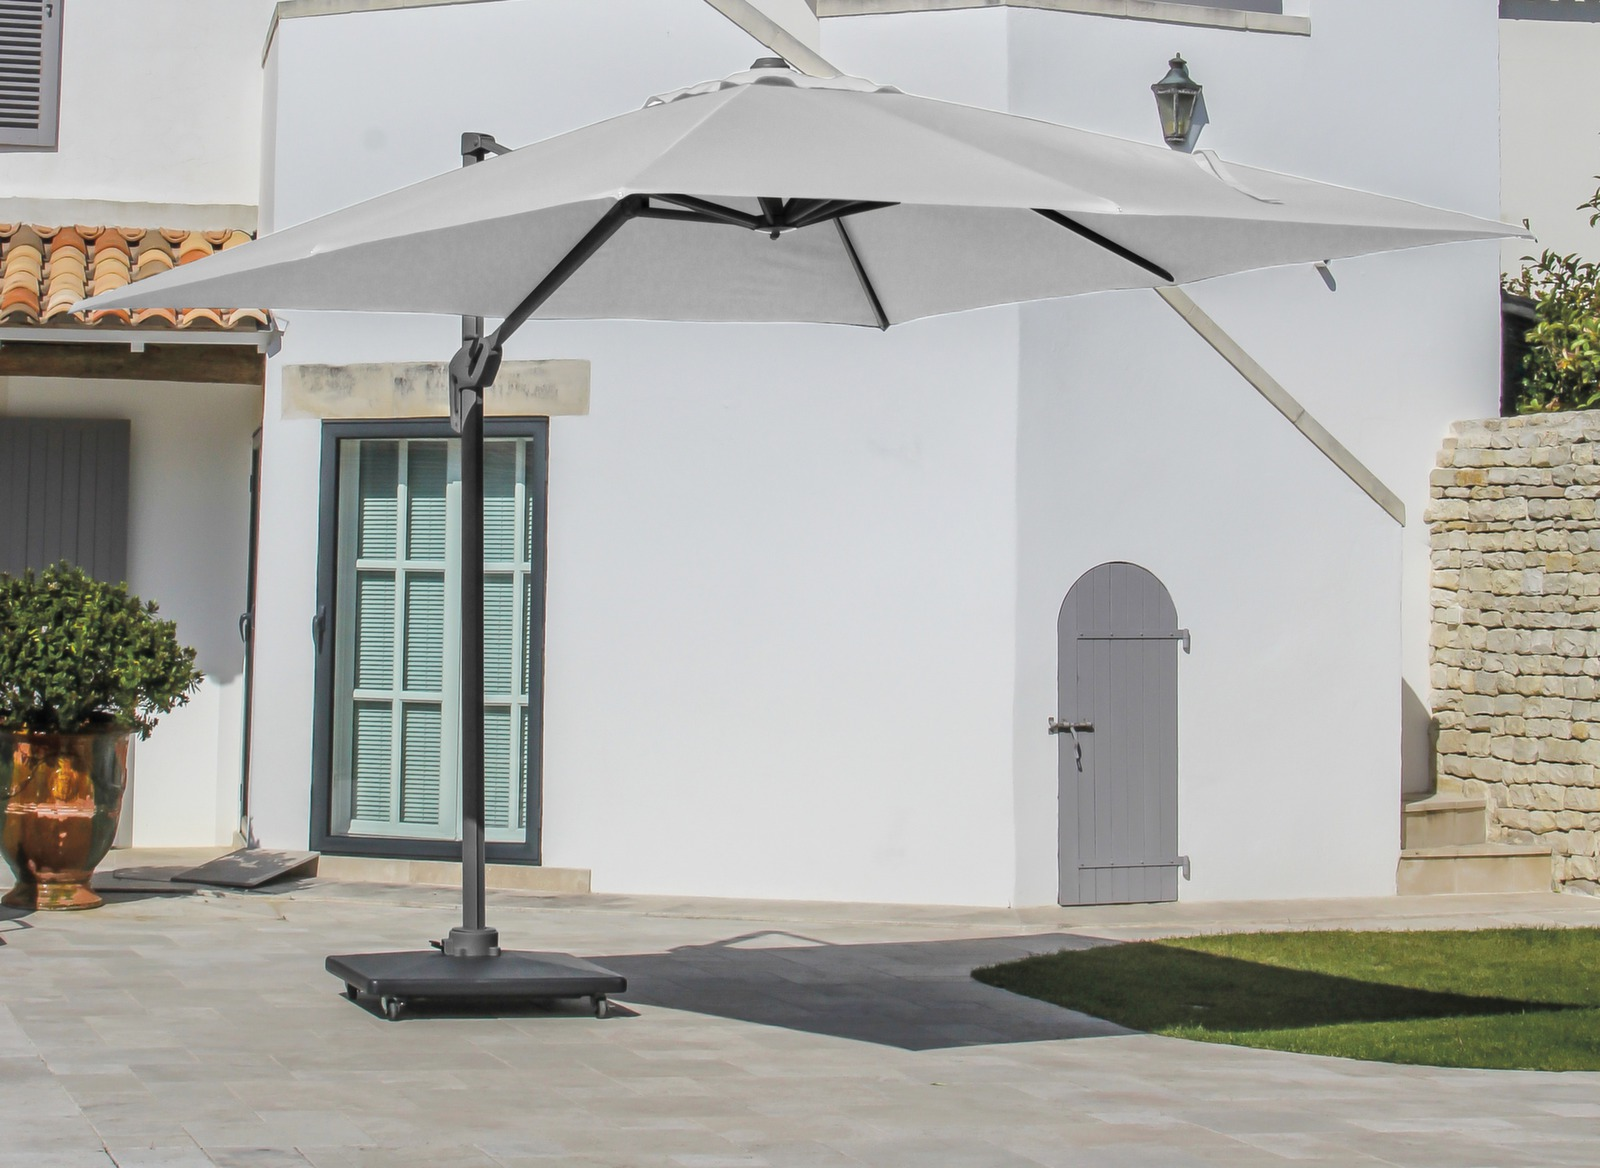 parasol d port carr 3x3m avec m t gris gamme oc o. Black Bedroom Furniture Sets. Home Design Ideas